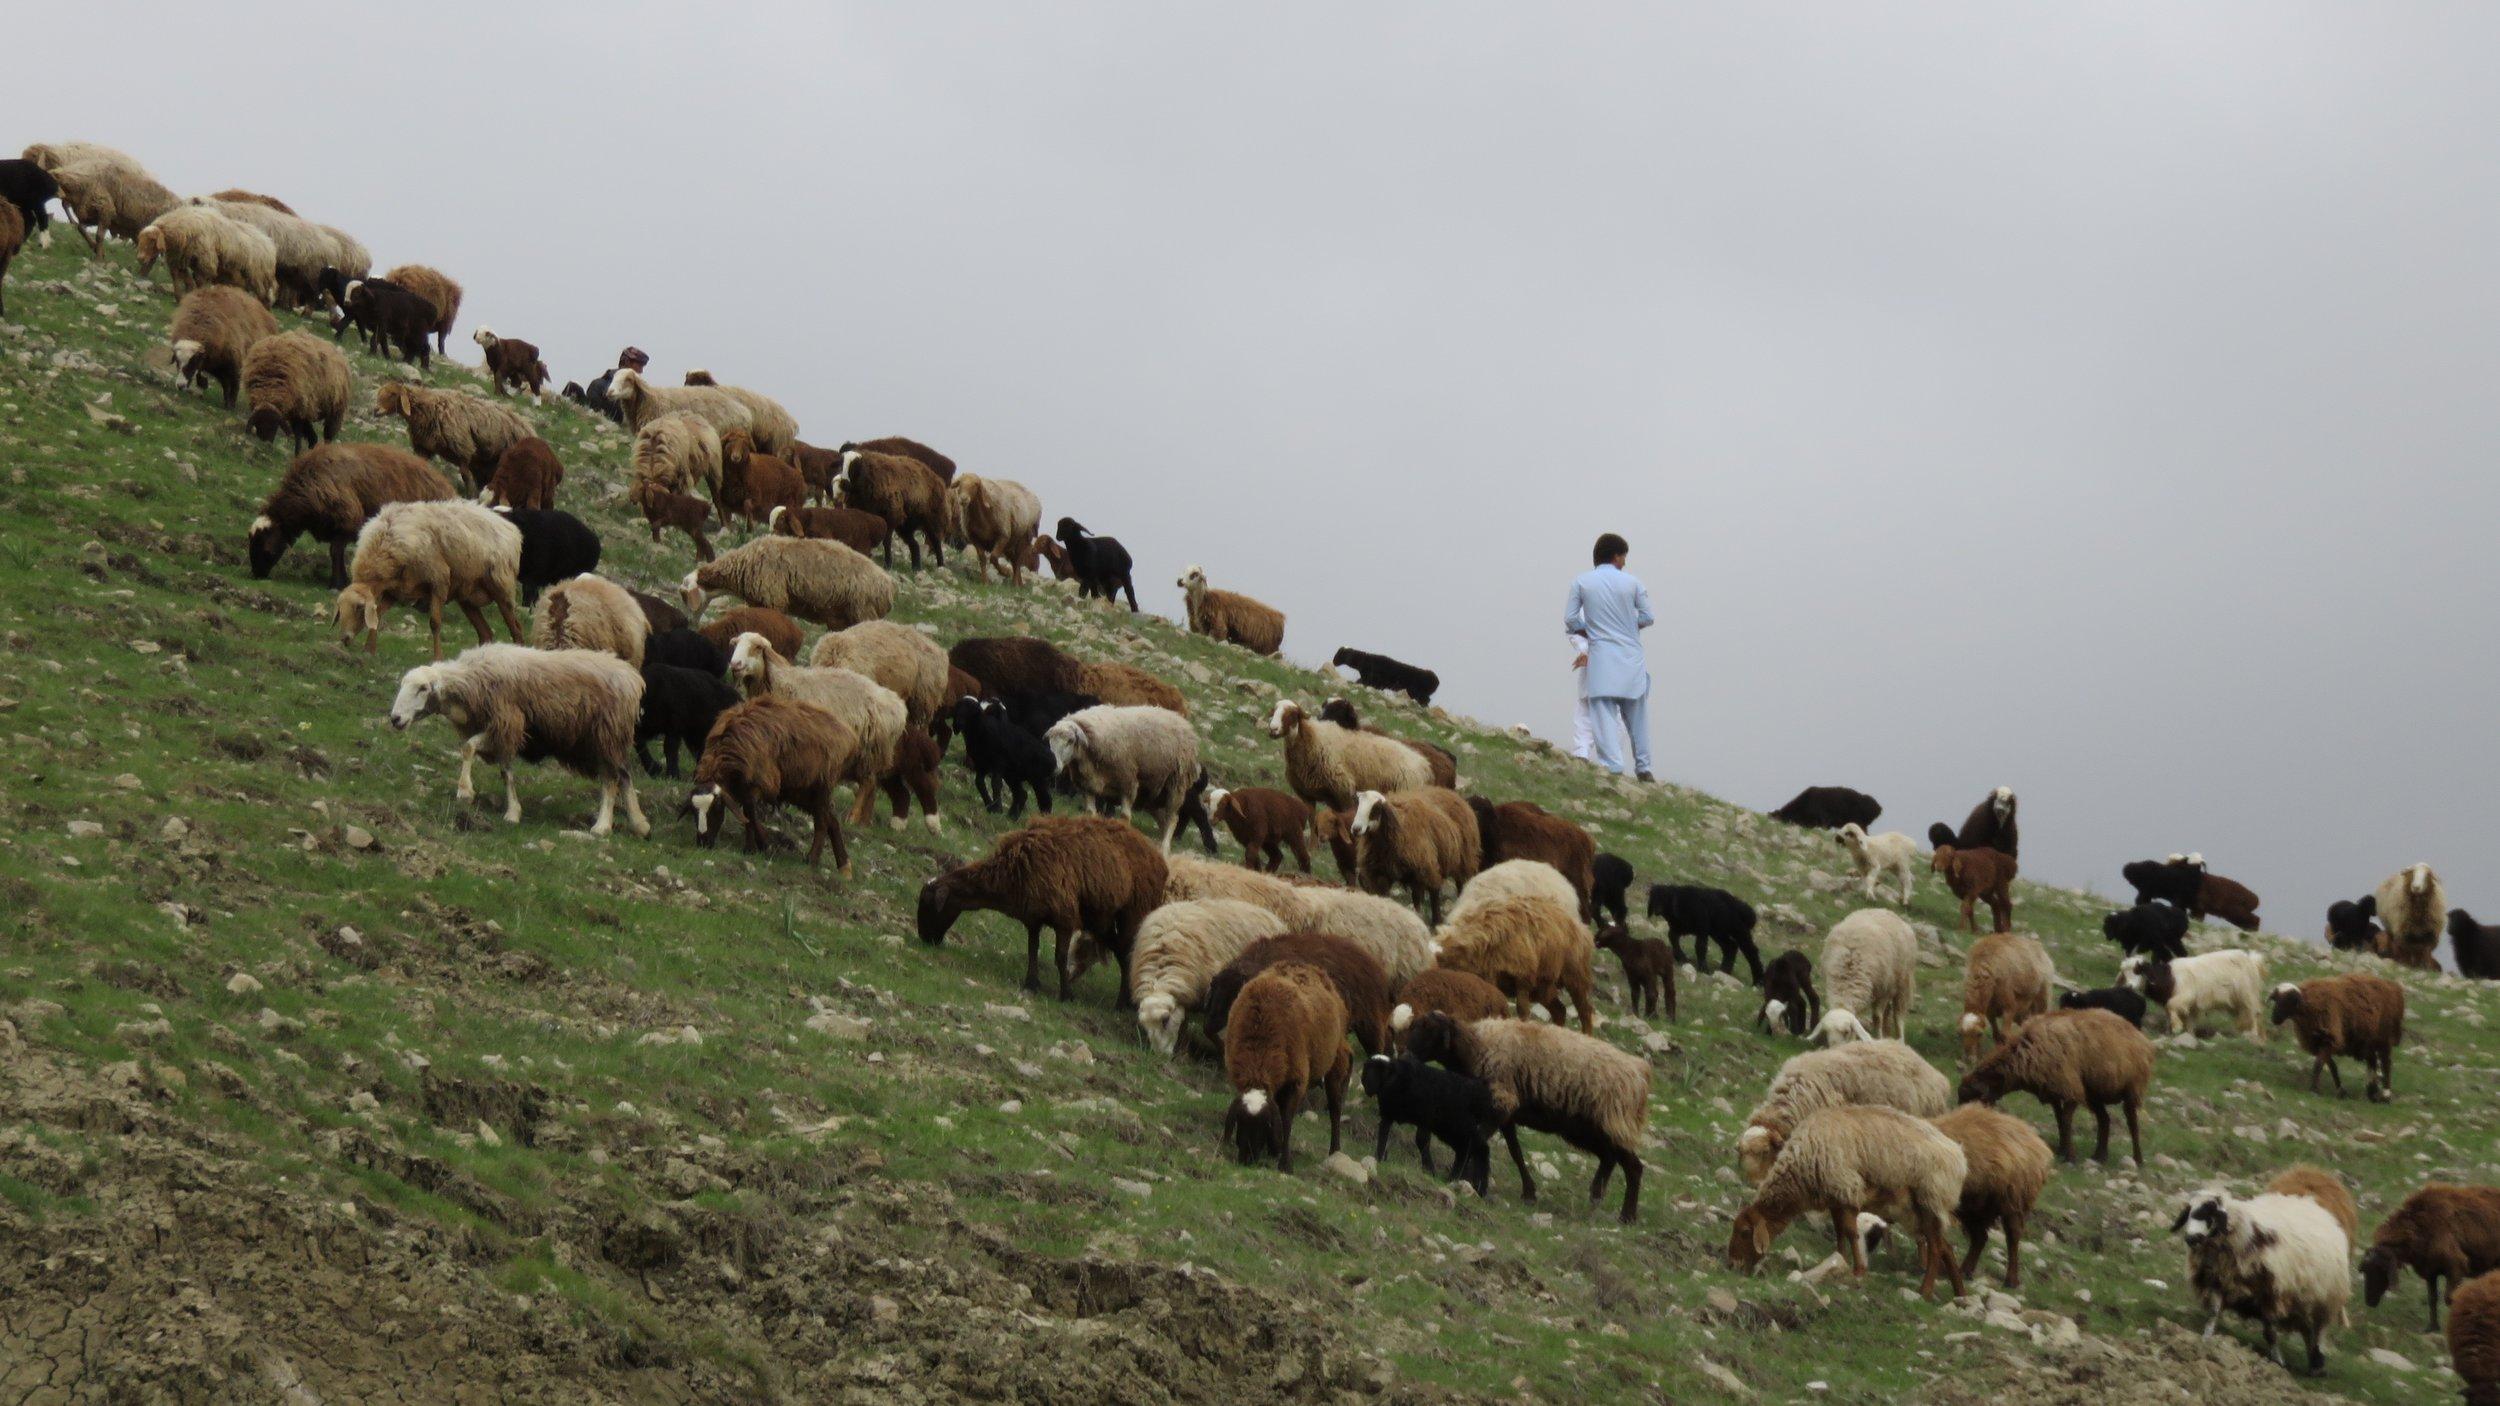 shepherd and sheep.jpg